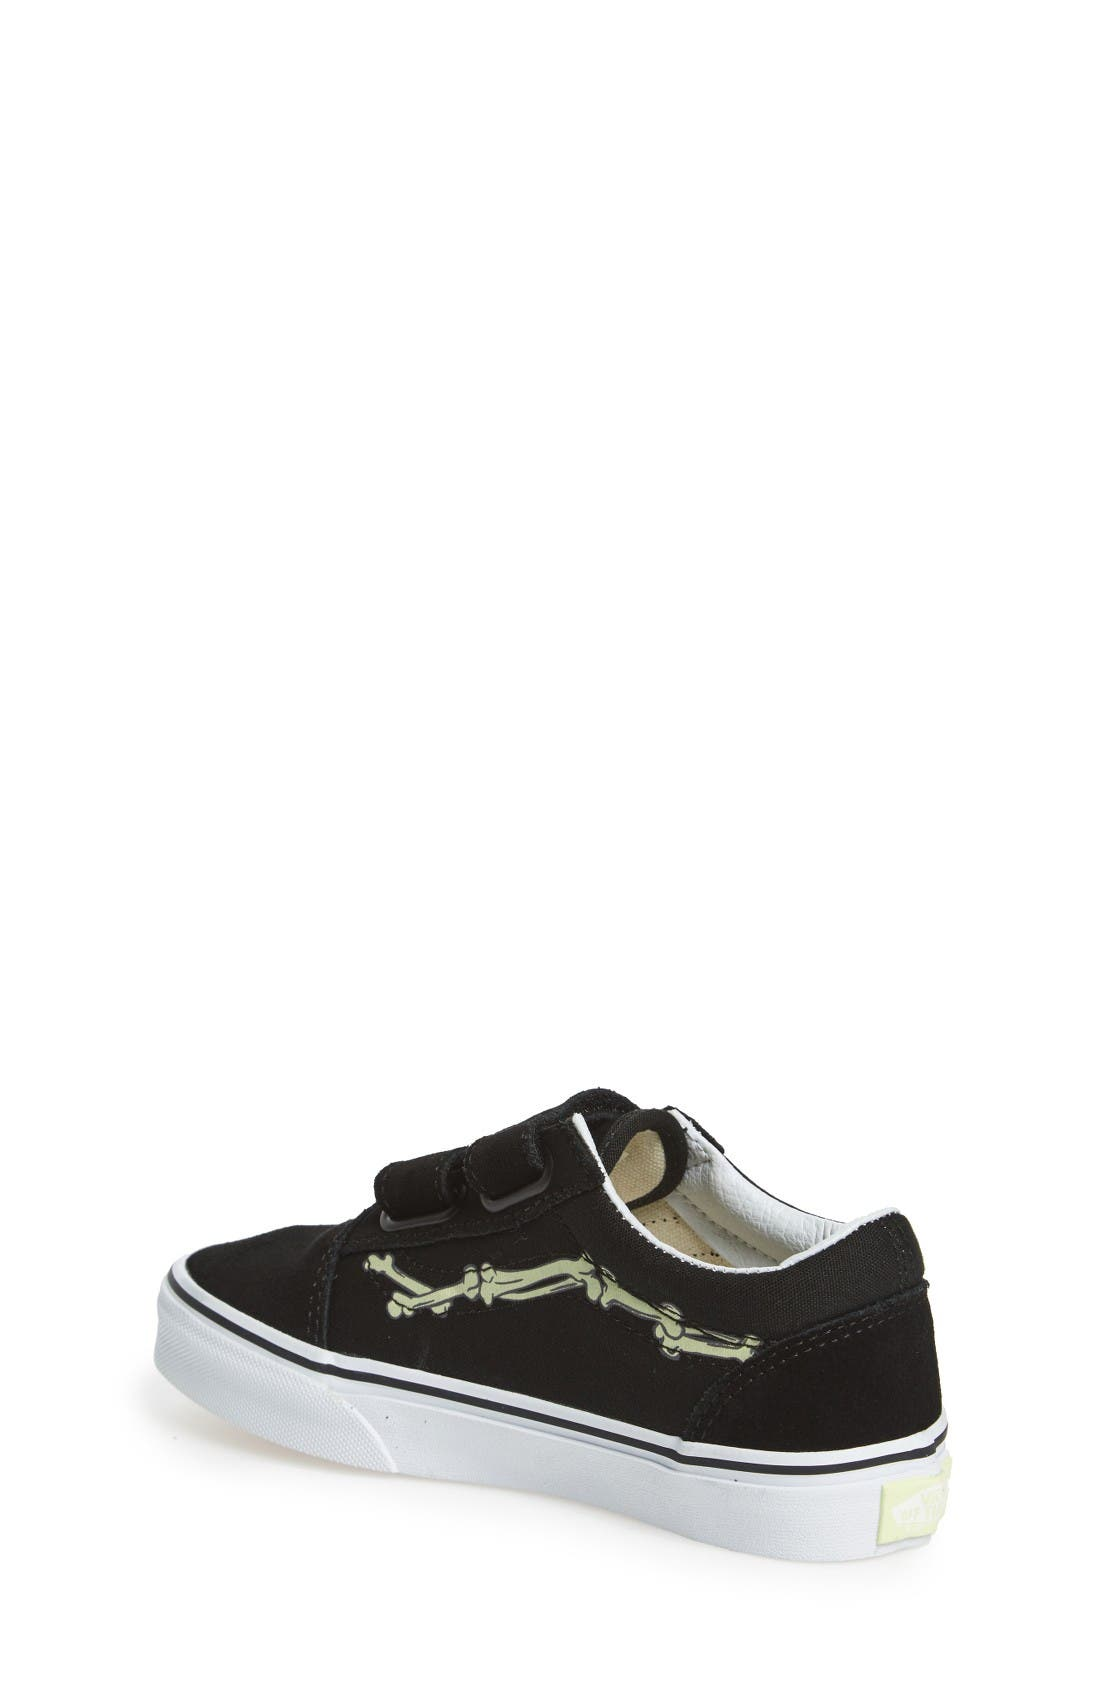 Old Skool Skate Sneaker,                             Alternate thumbnail 2, color,                             Glow Bones Black/ White